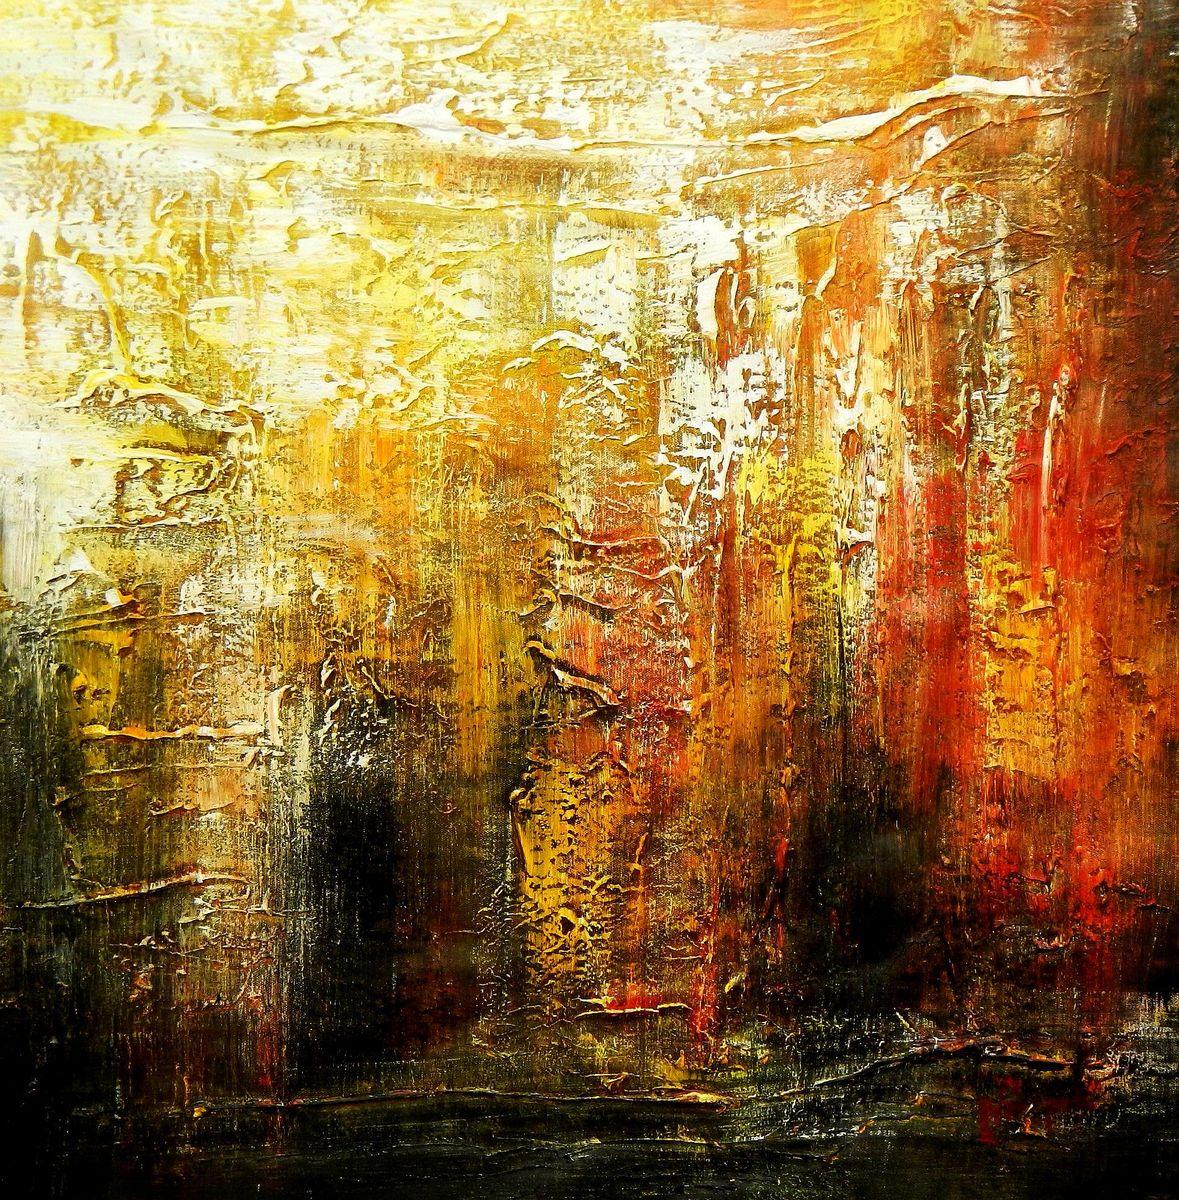 Abstrakt - Berlin am Lustgarten e94613 G 60x60cm Ölbild handgemalt